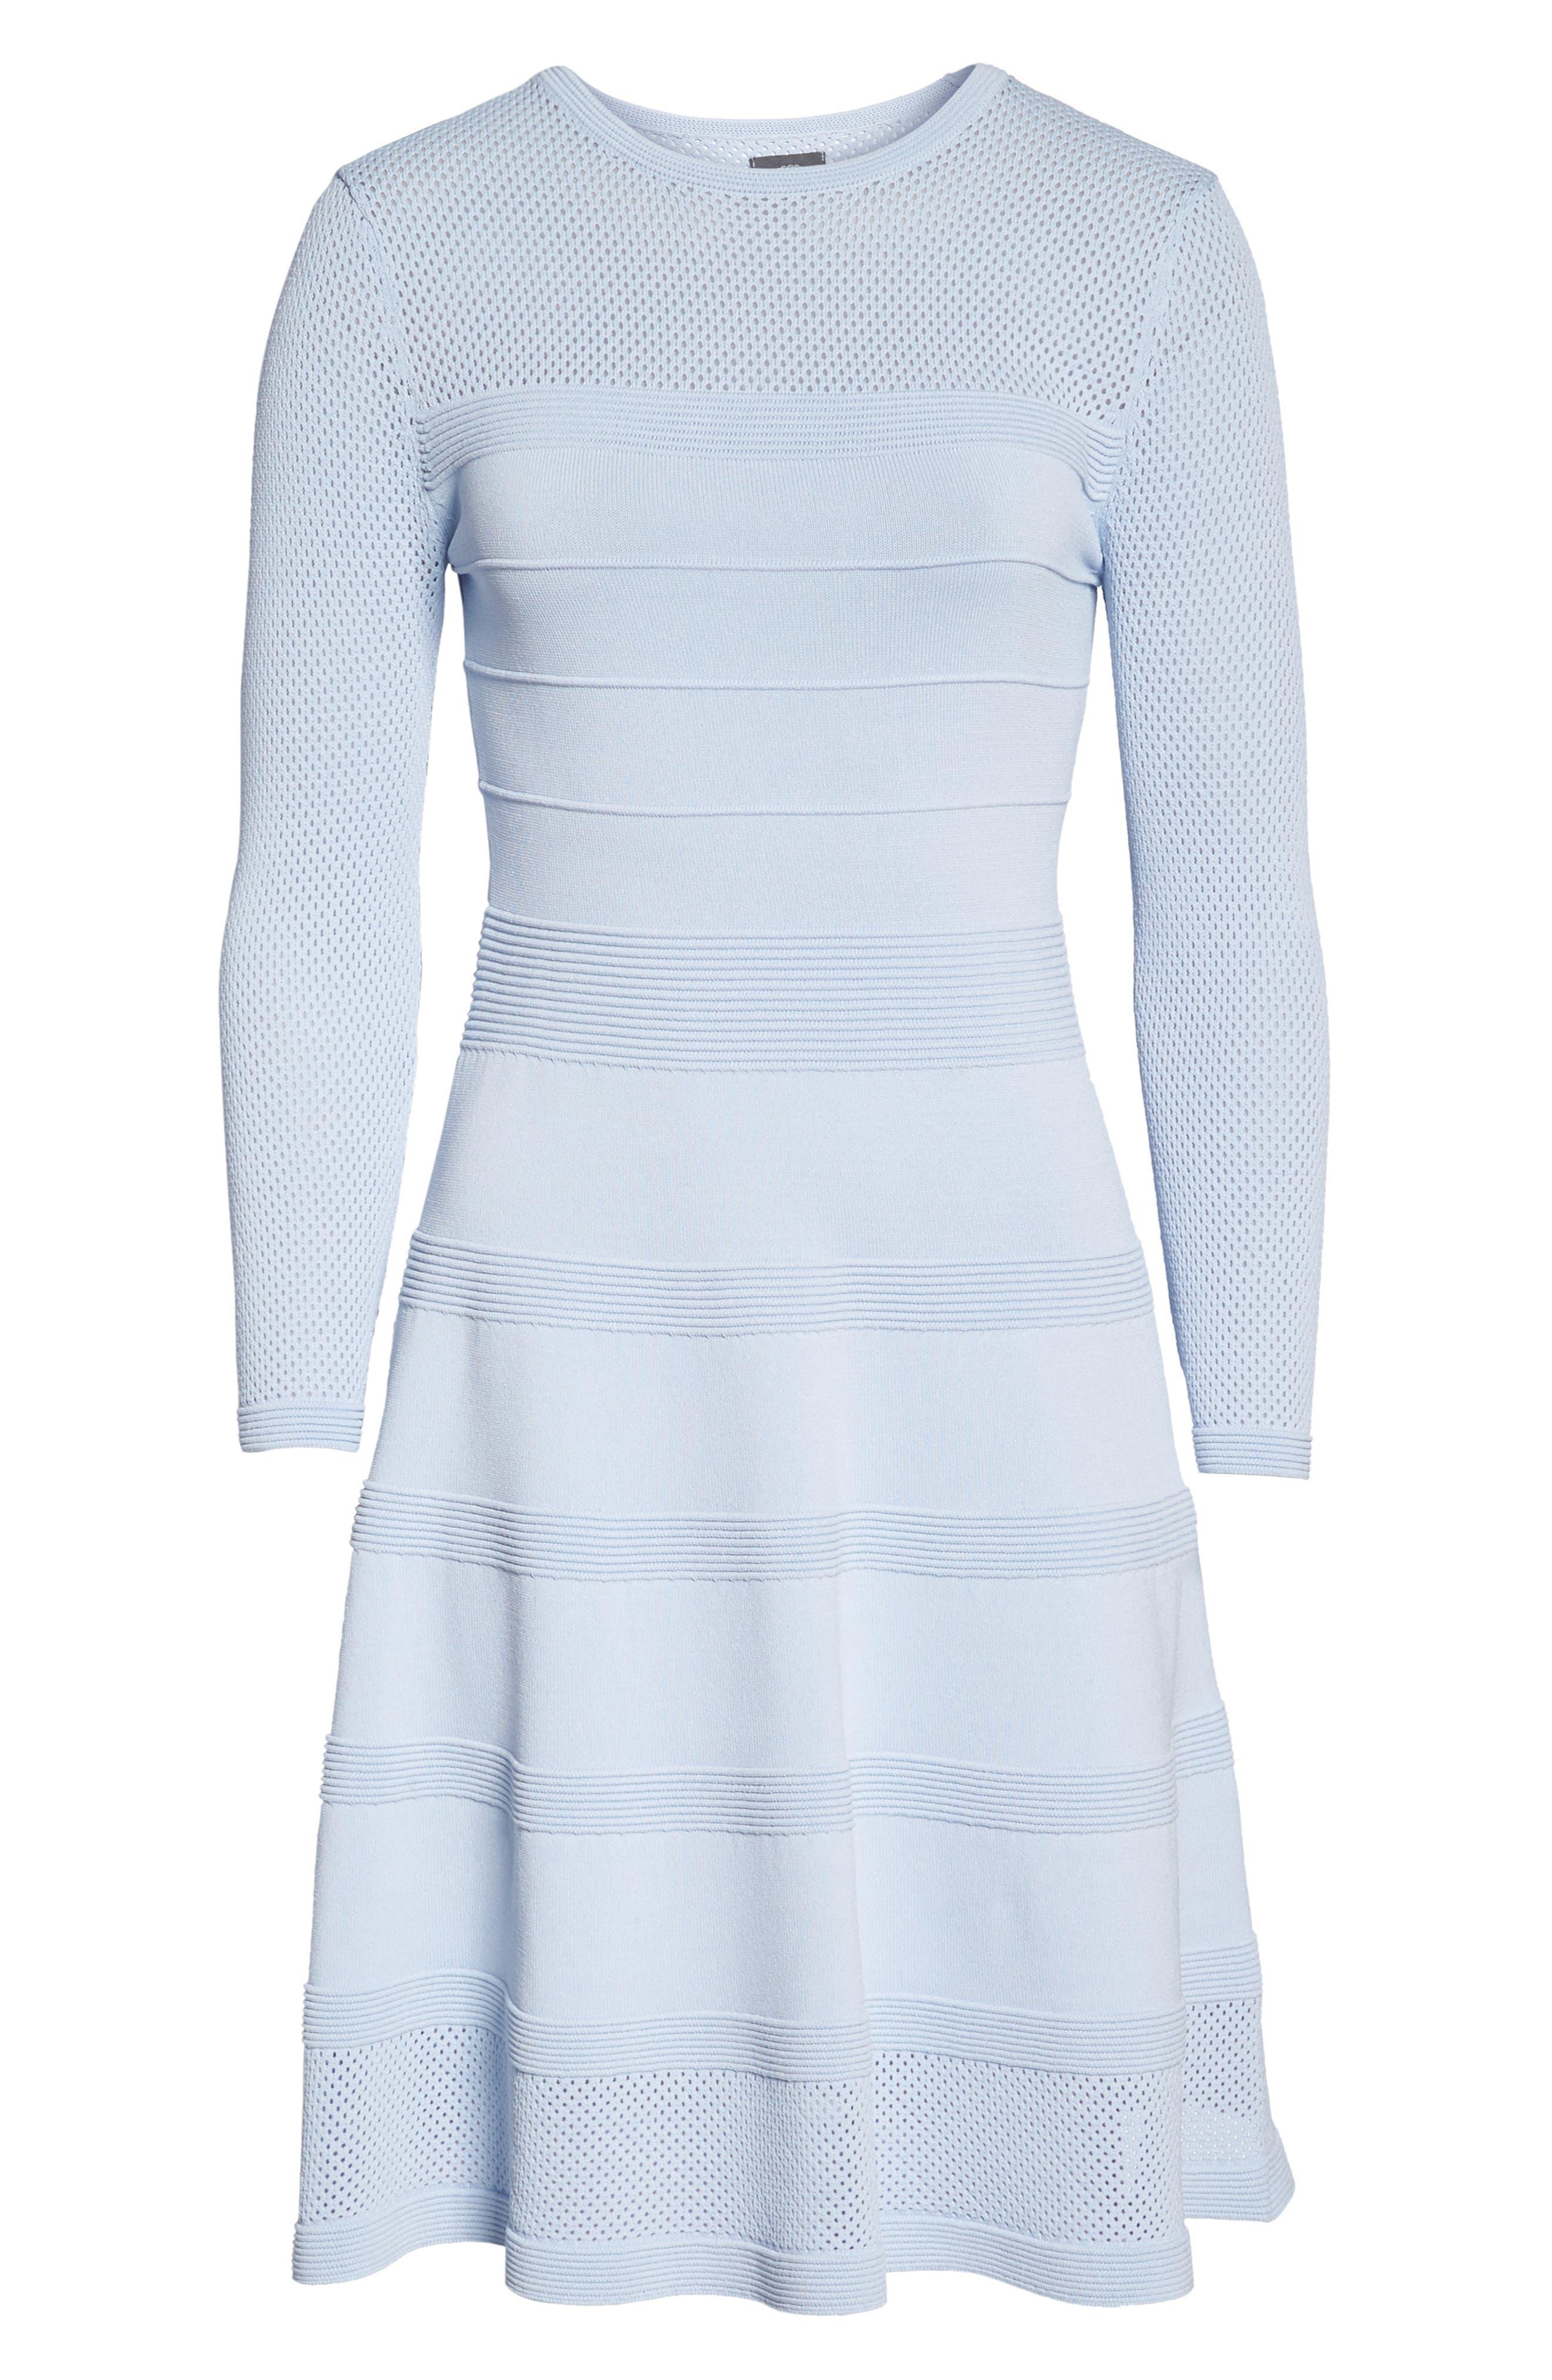 Mix Stitch Pointelle Fit & Flare Dress,                             Alternate thumbnail 6, color,                             Blue